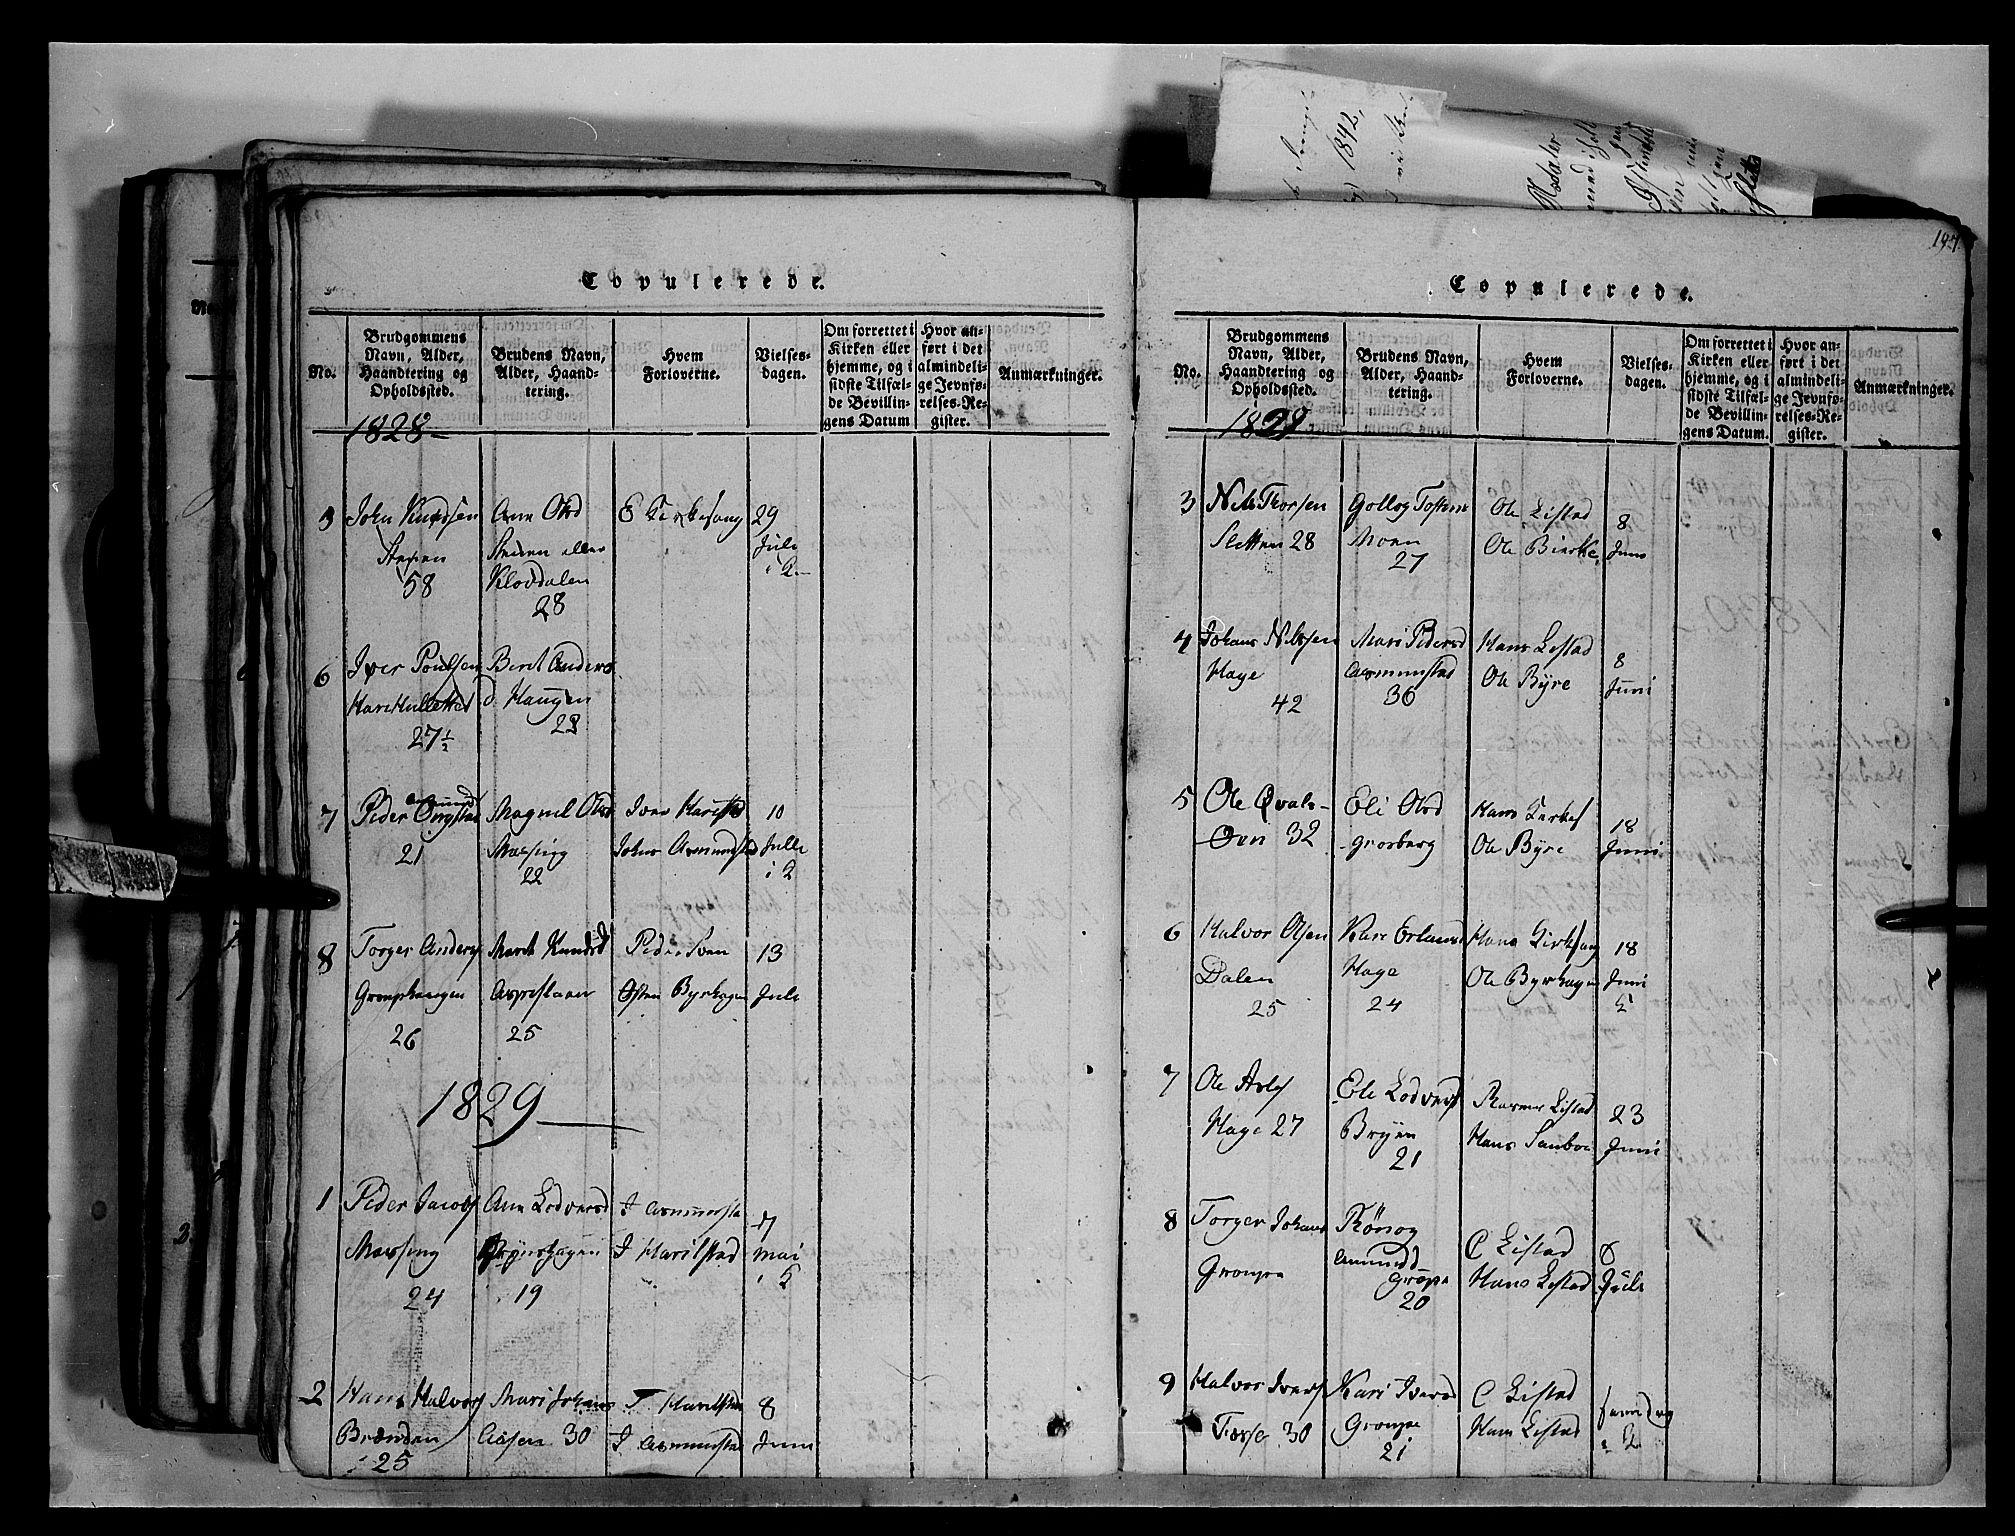 SAH, Fron prestekontor, H/Ha/Hab/L0003: Klokkerbok nr. 3, 1816-1850, s. 197